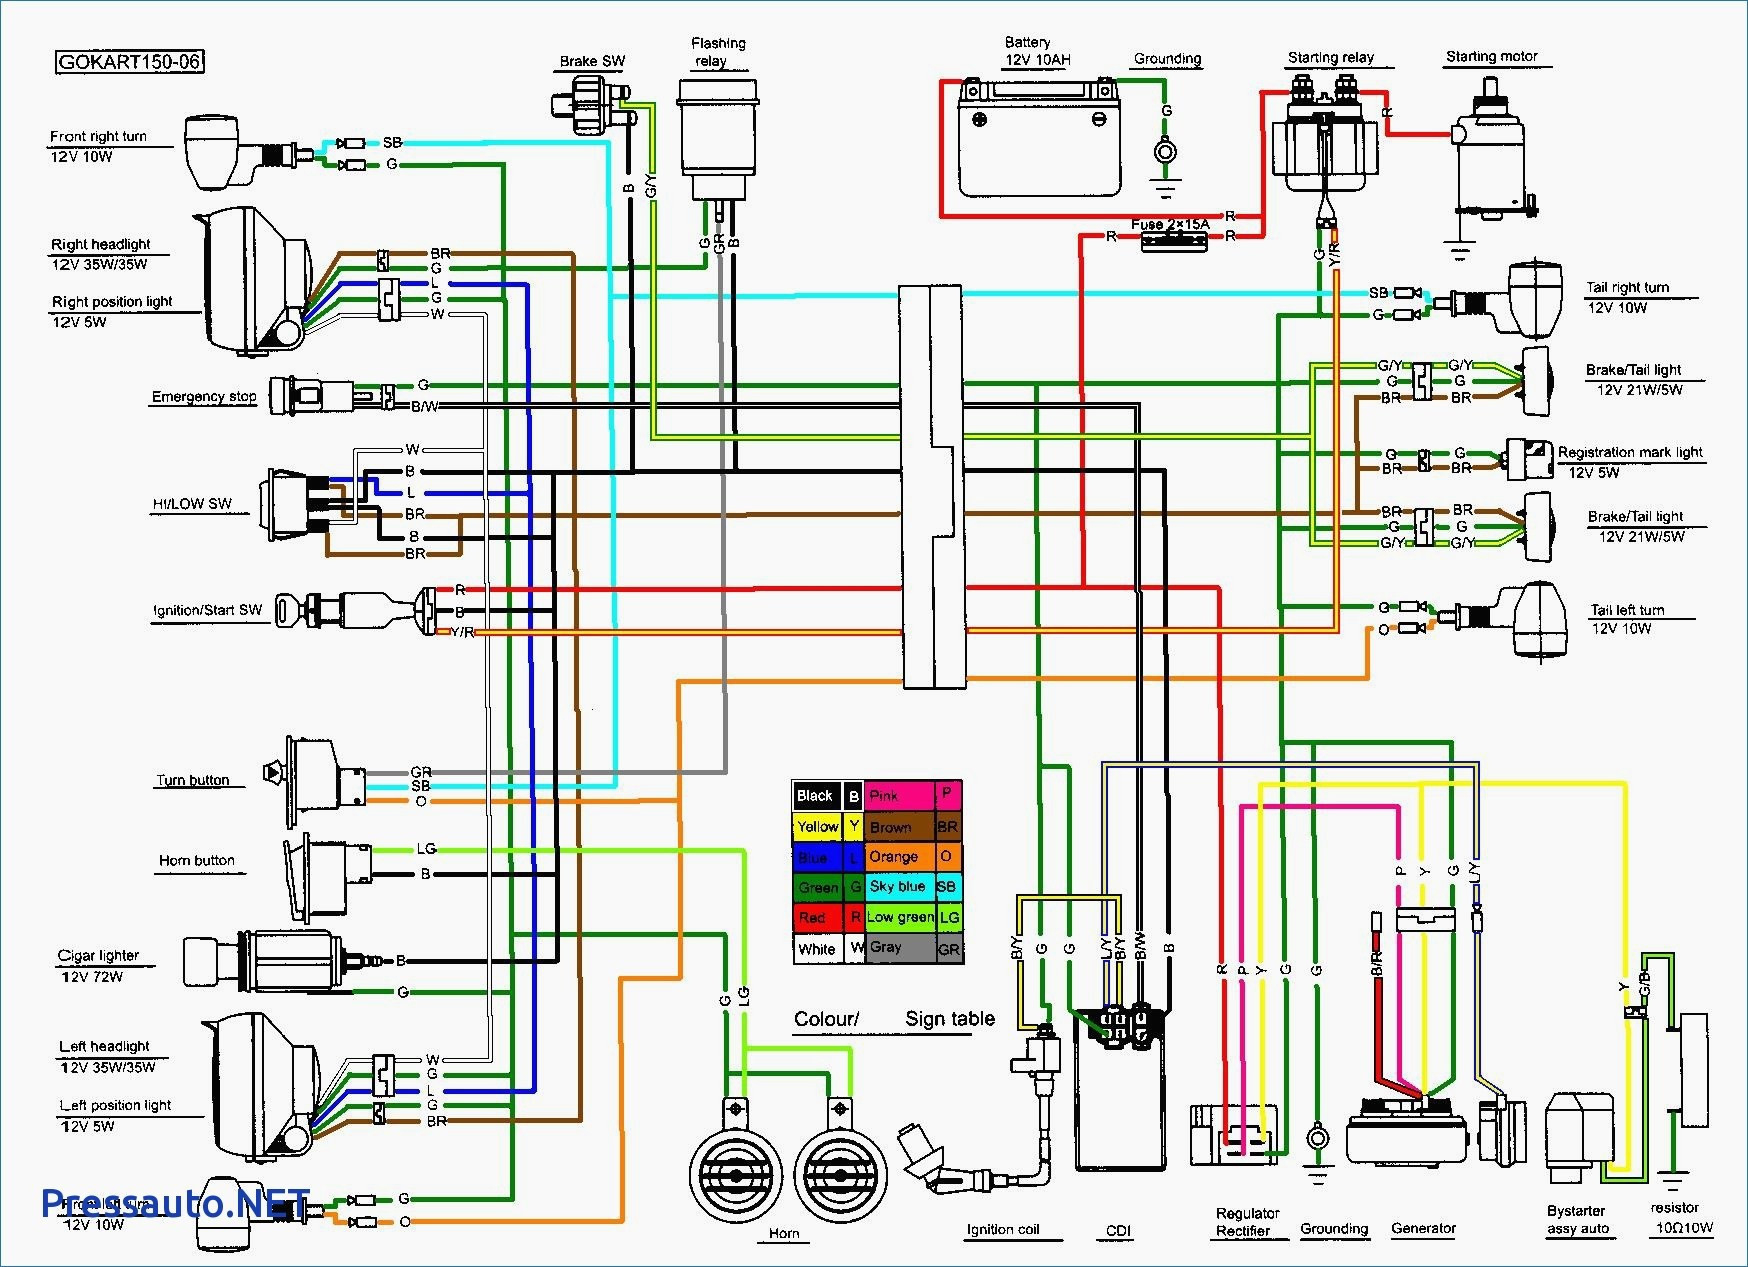 110Cc Chinese Atv Wiring Harness - Wiring Diagram Data - Chinese 125Cc Atv Wiring Diagram